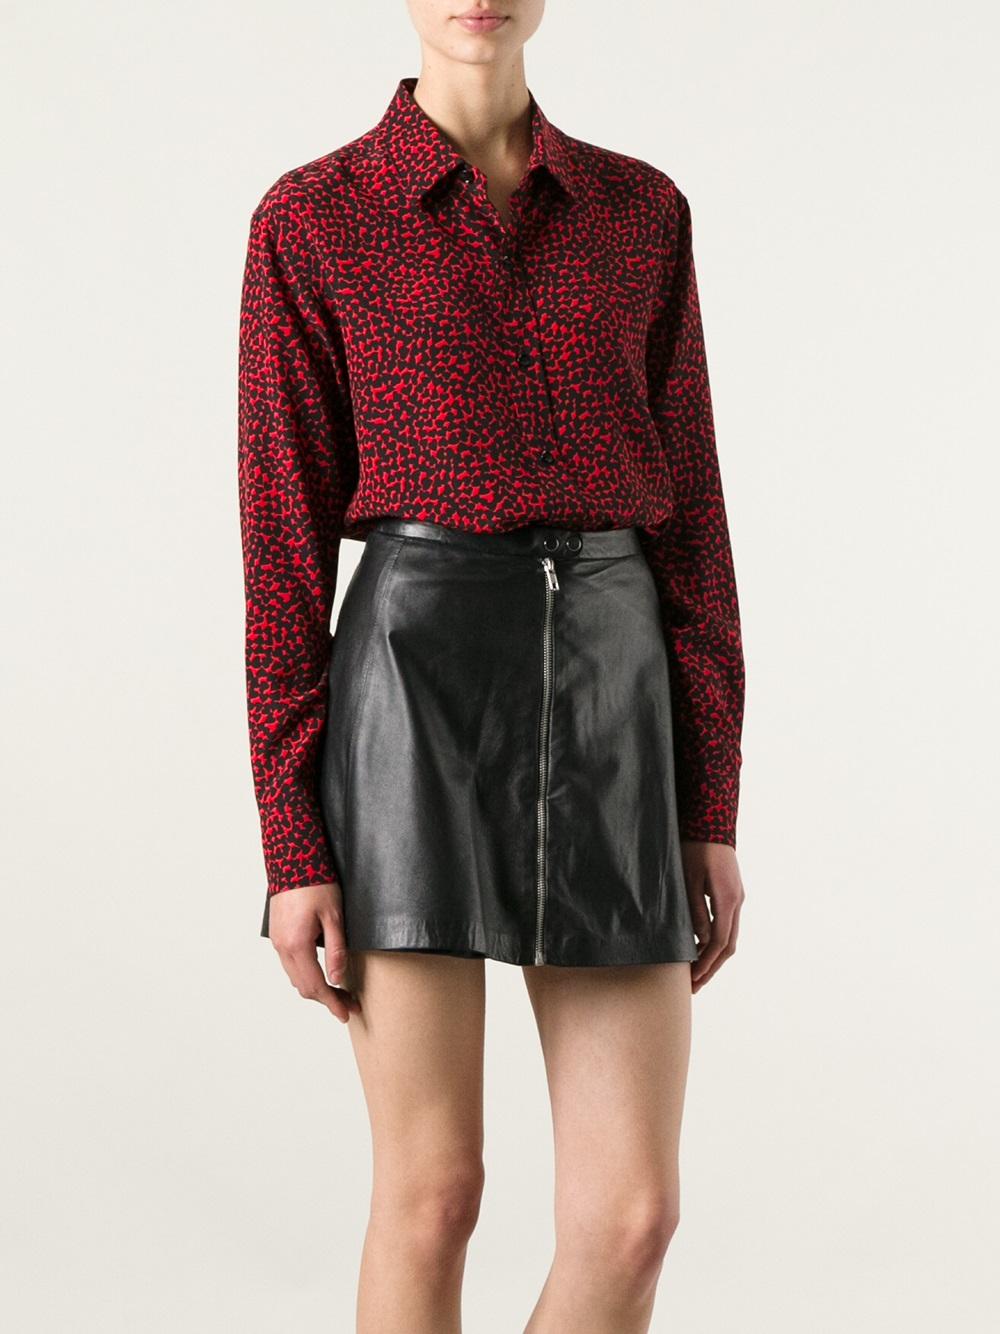 Saint laurent heart print shirt in red lyst for Saint laurent shirt womens